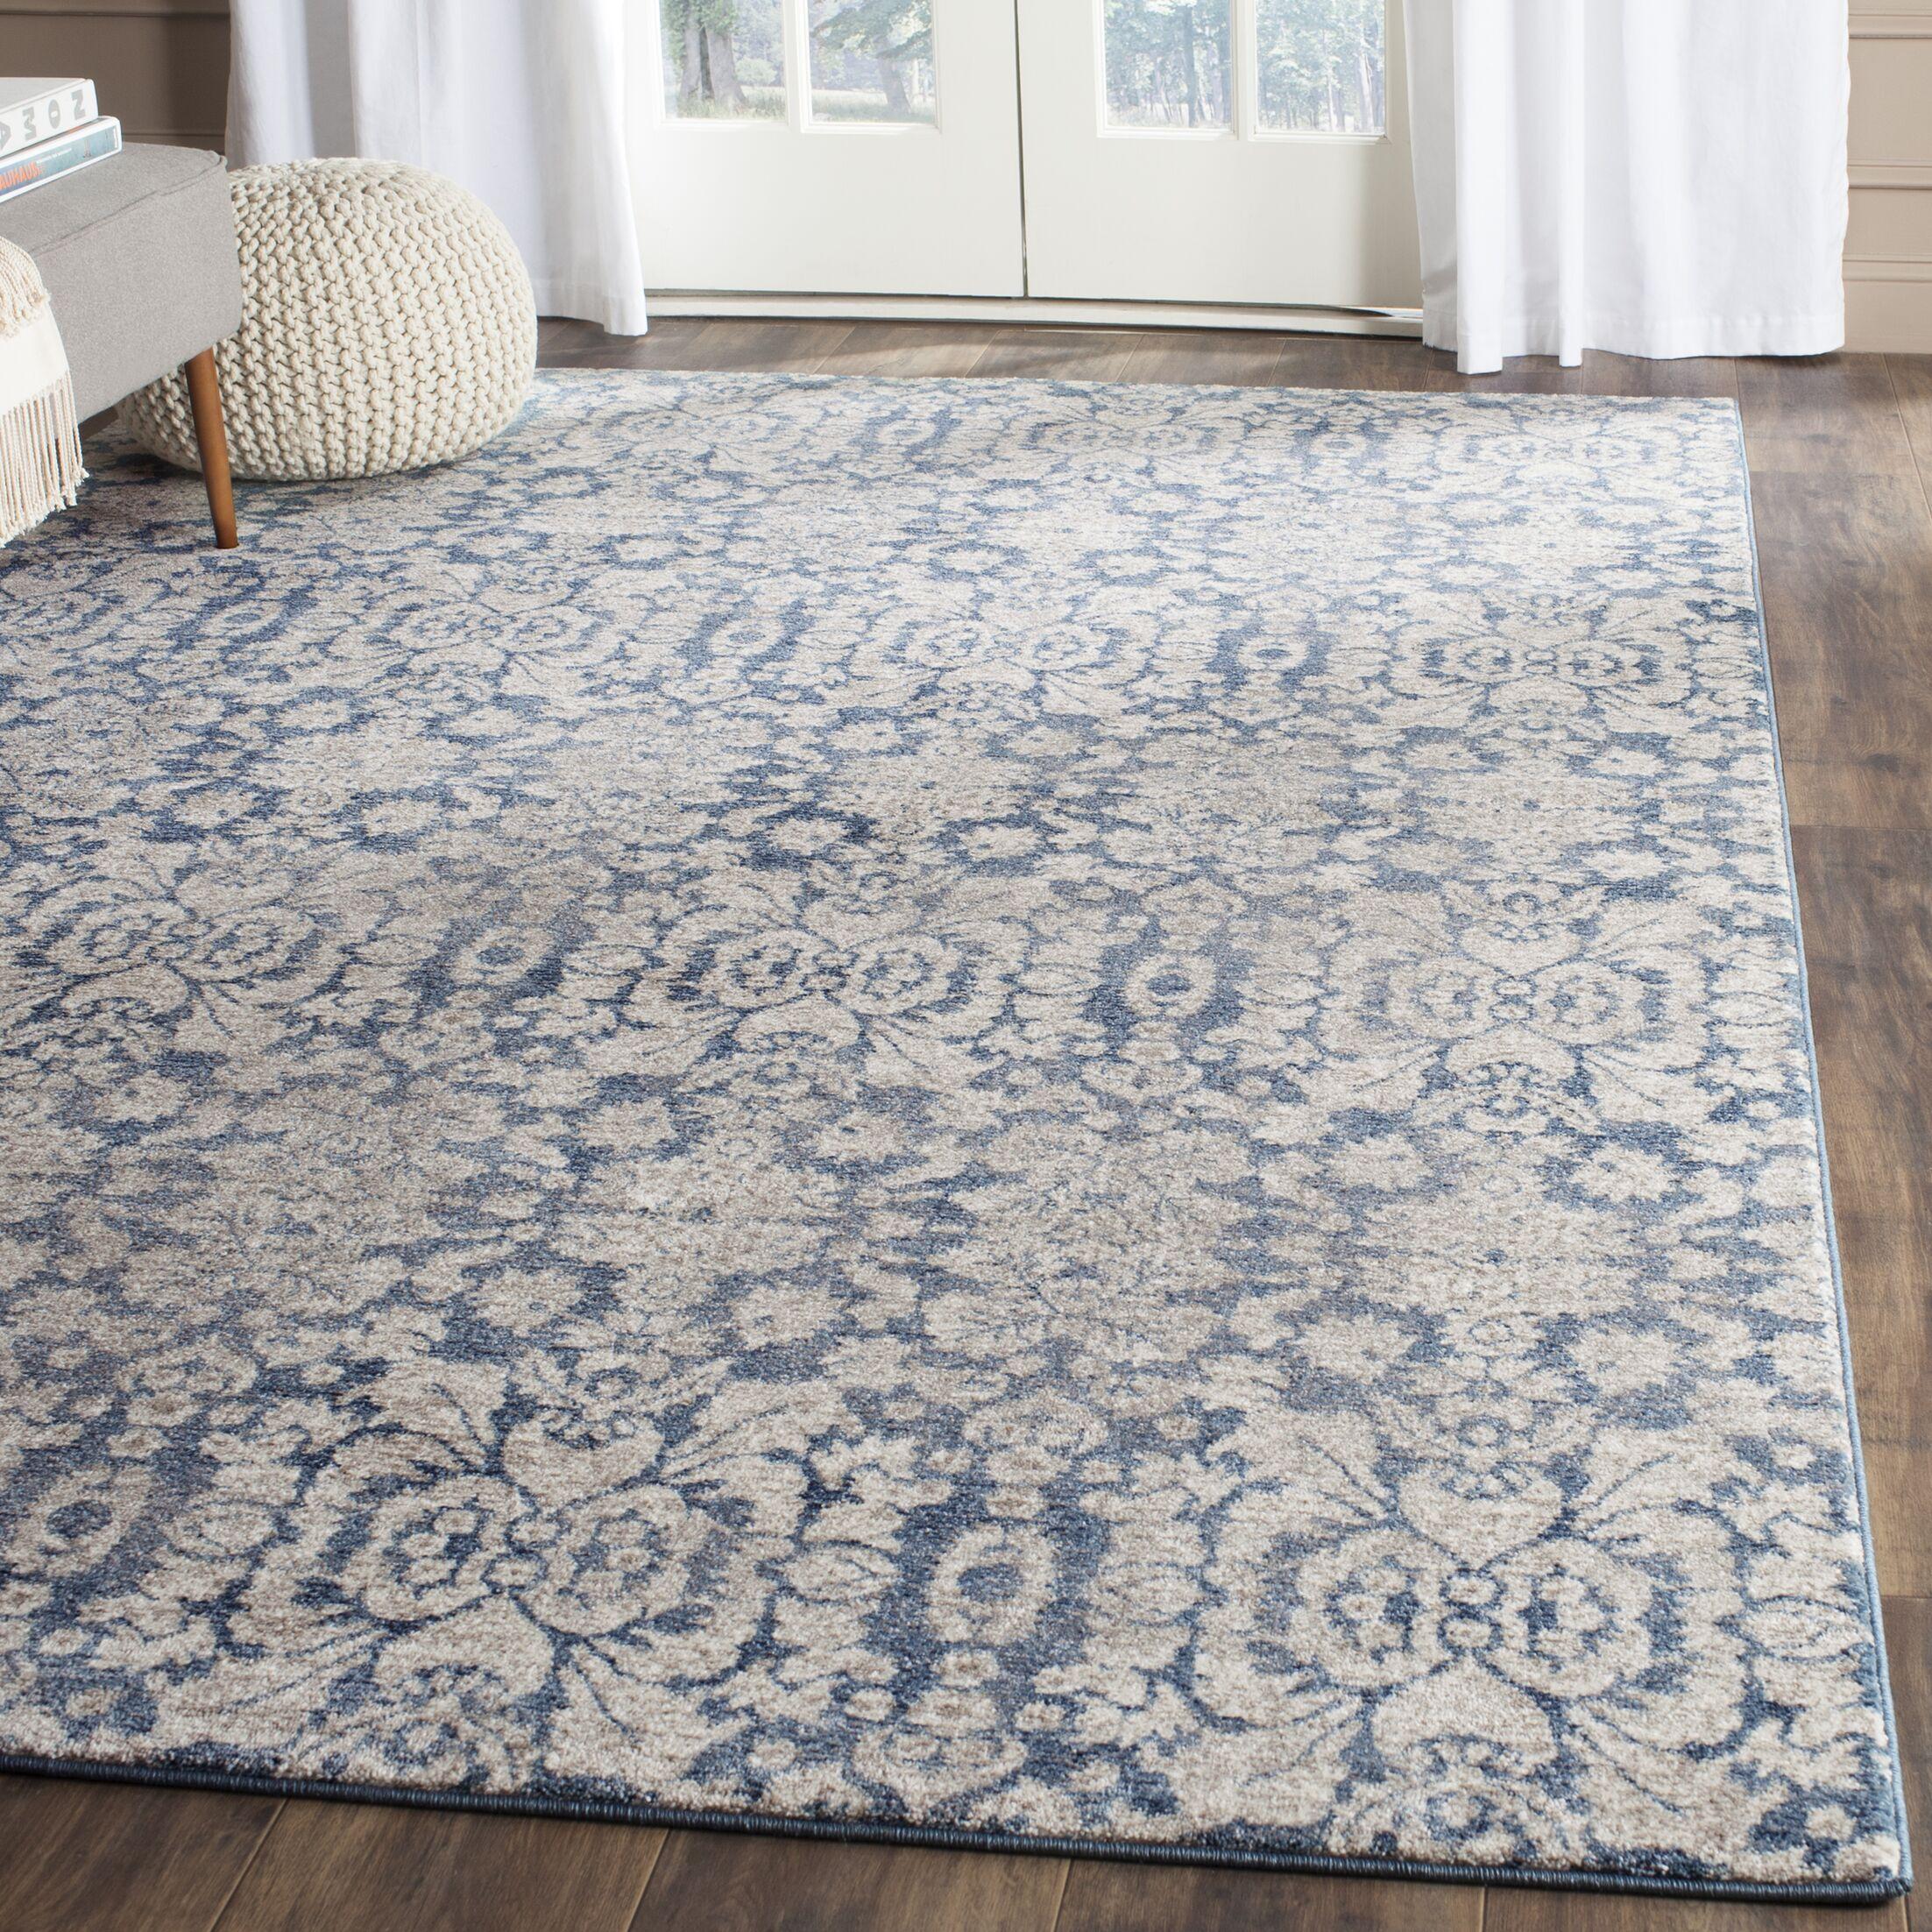 Sofia Blue/Beige Area Rug Rug Size: Rectangle 10' x 14'